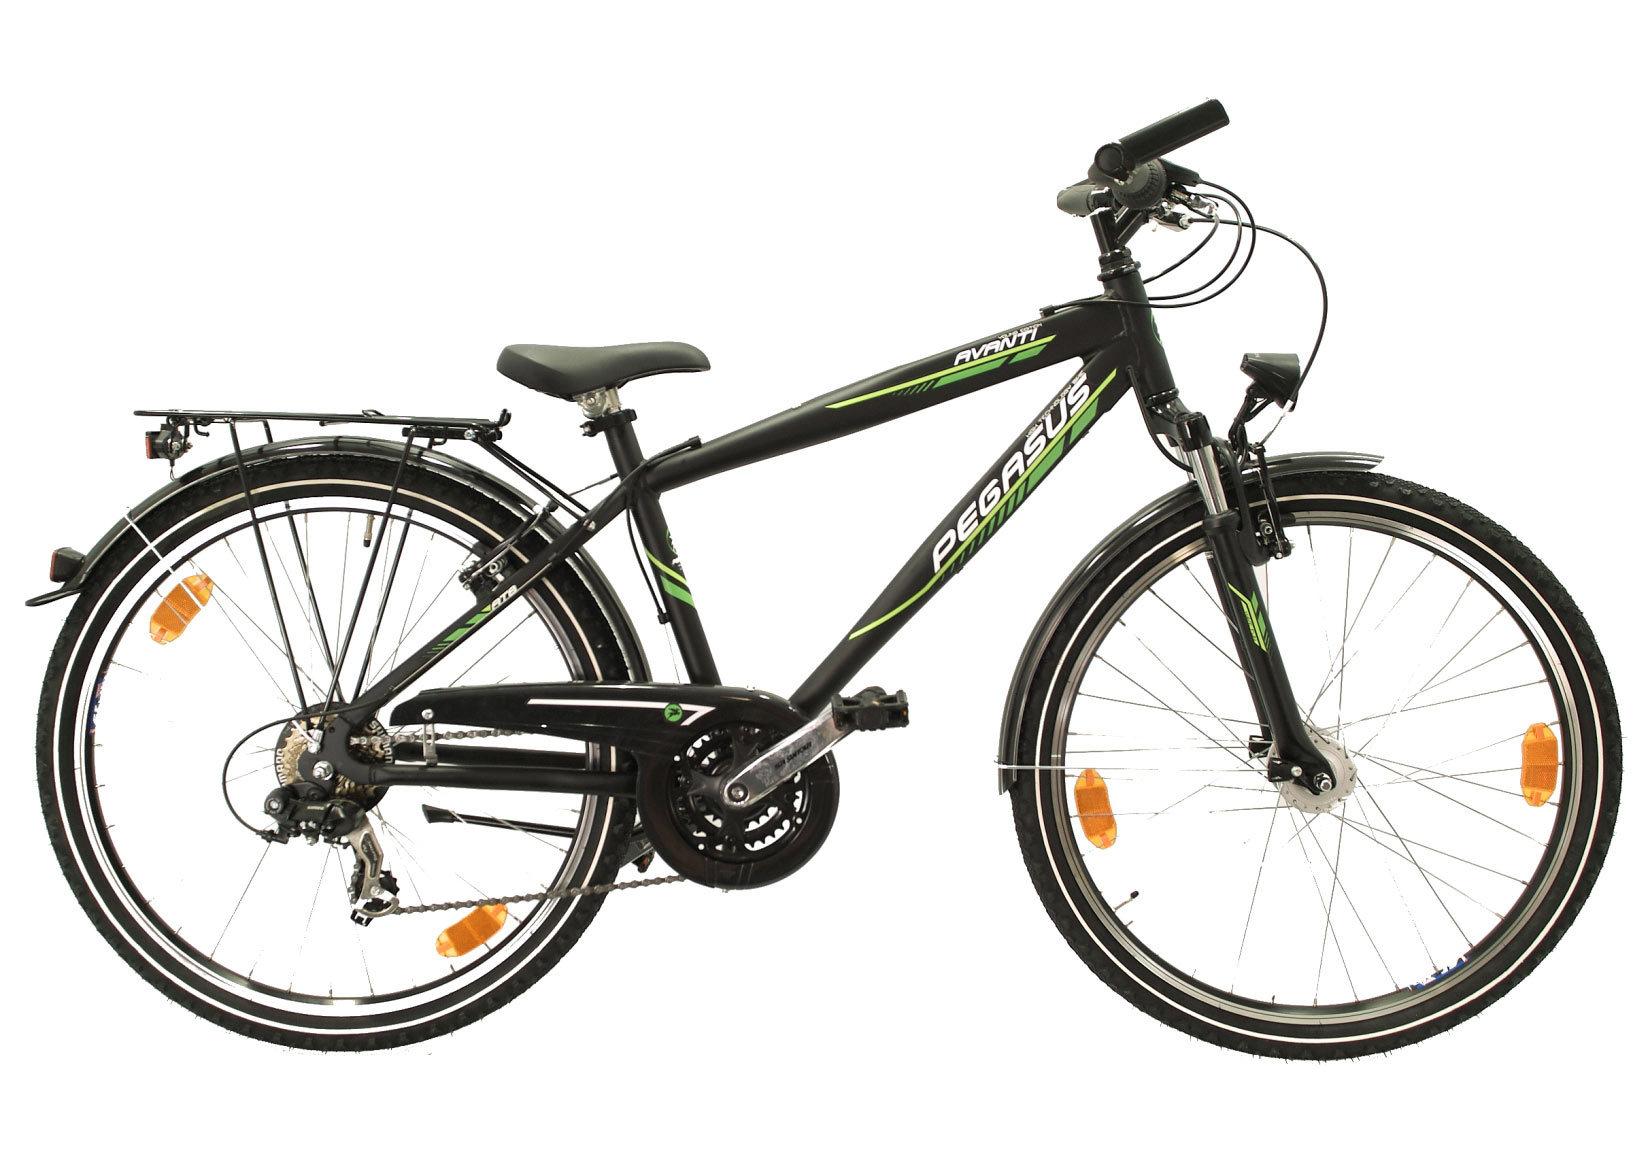 jugend fahrrad pegasus avanti 26 zoll shimano 21 g schwarz. Black Bedroom Furniture Sets. Home Design Ideas